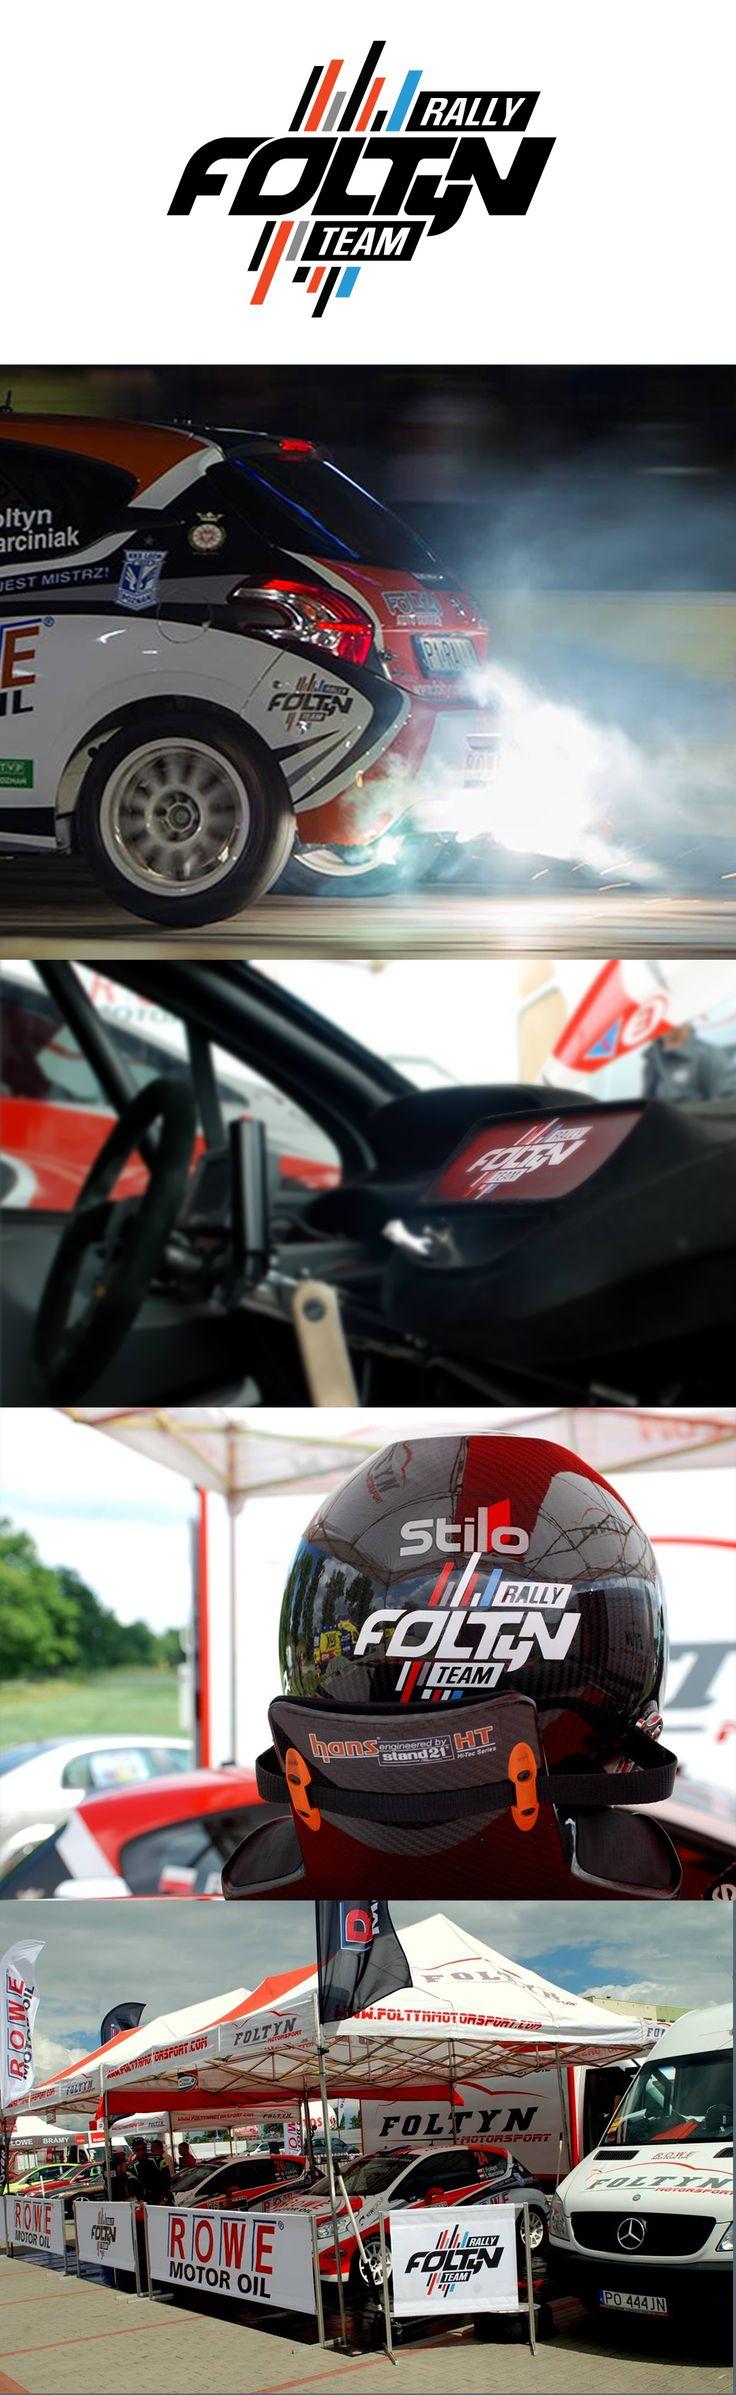 "2015, Logo for ""Foltyn Rally Team"", our original font, webgrafika.pl"